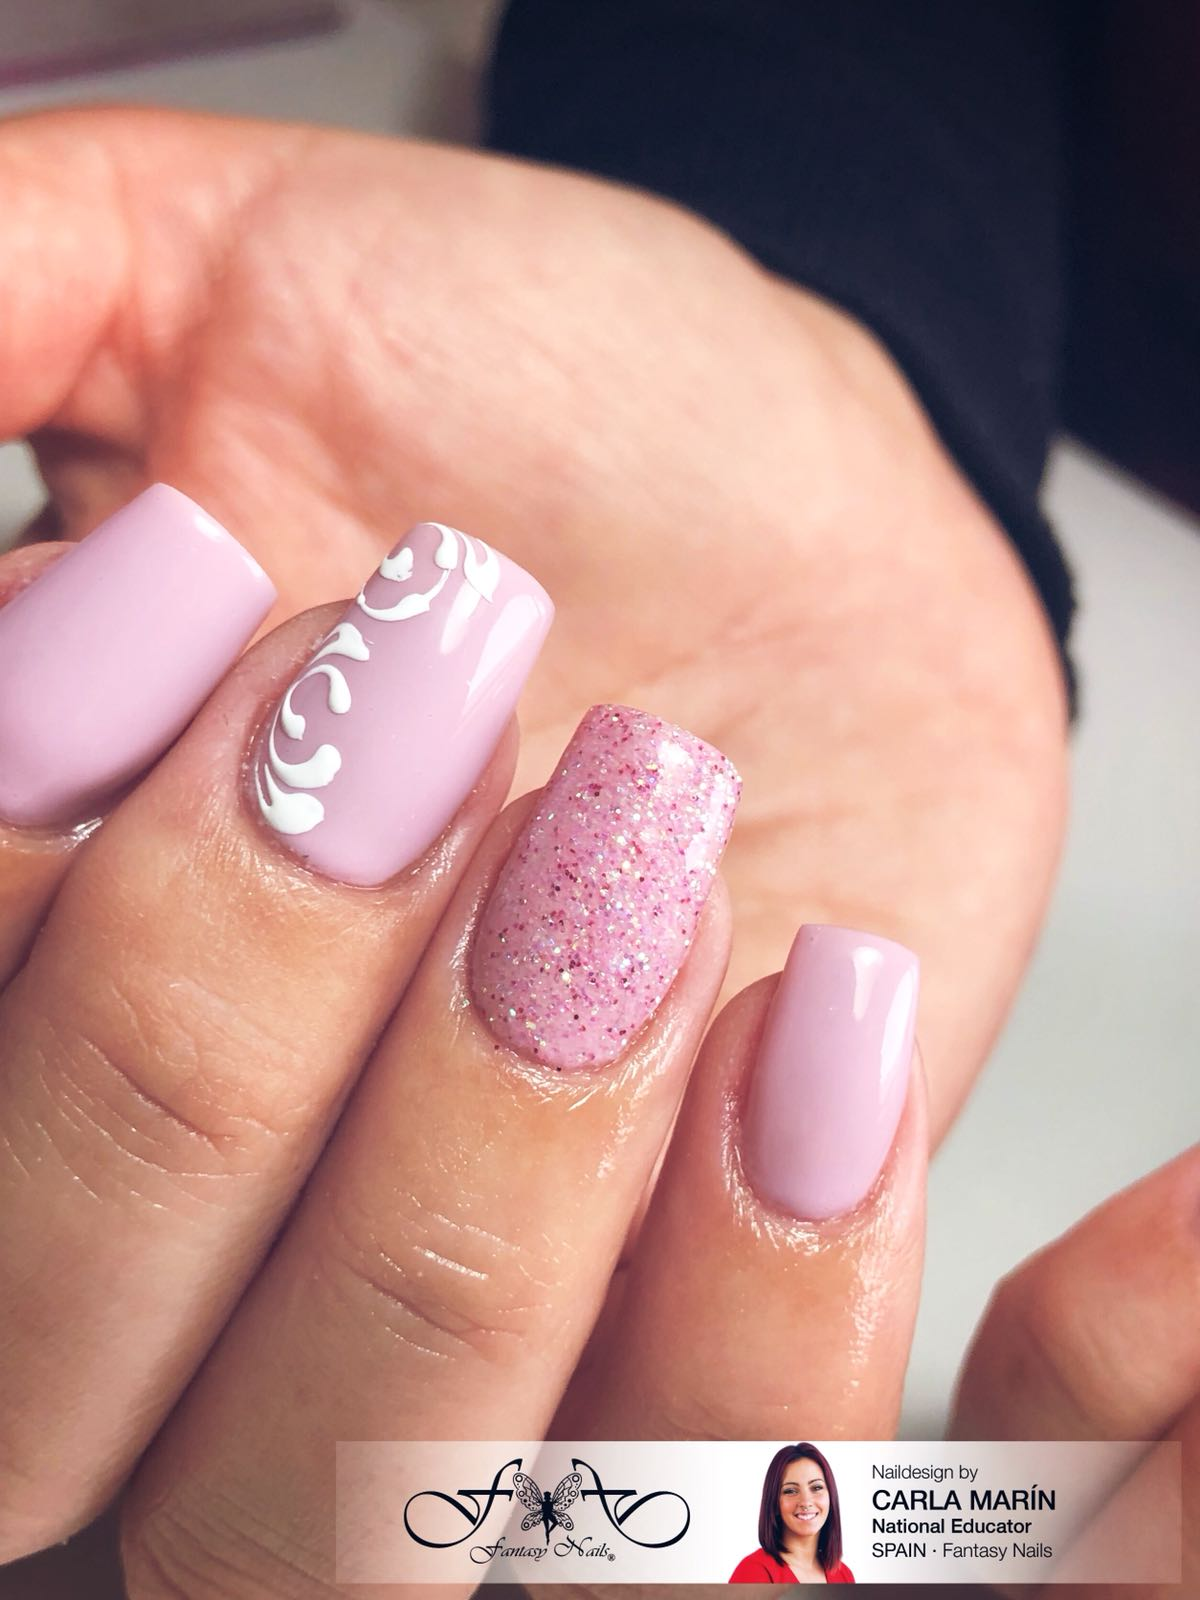 Nails design 4